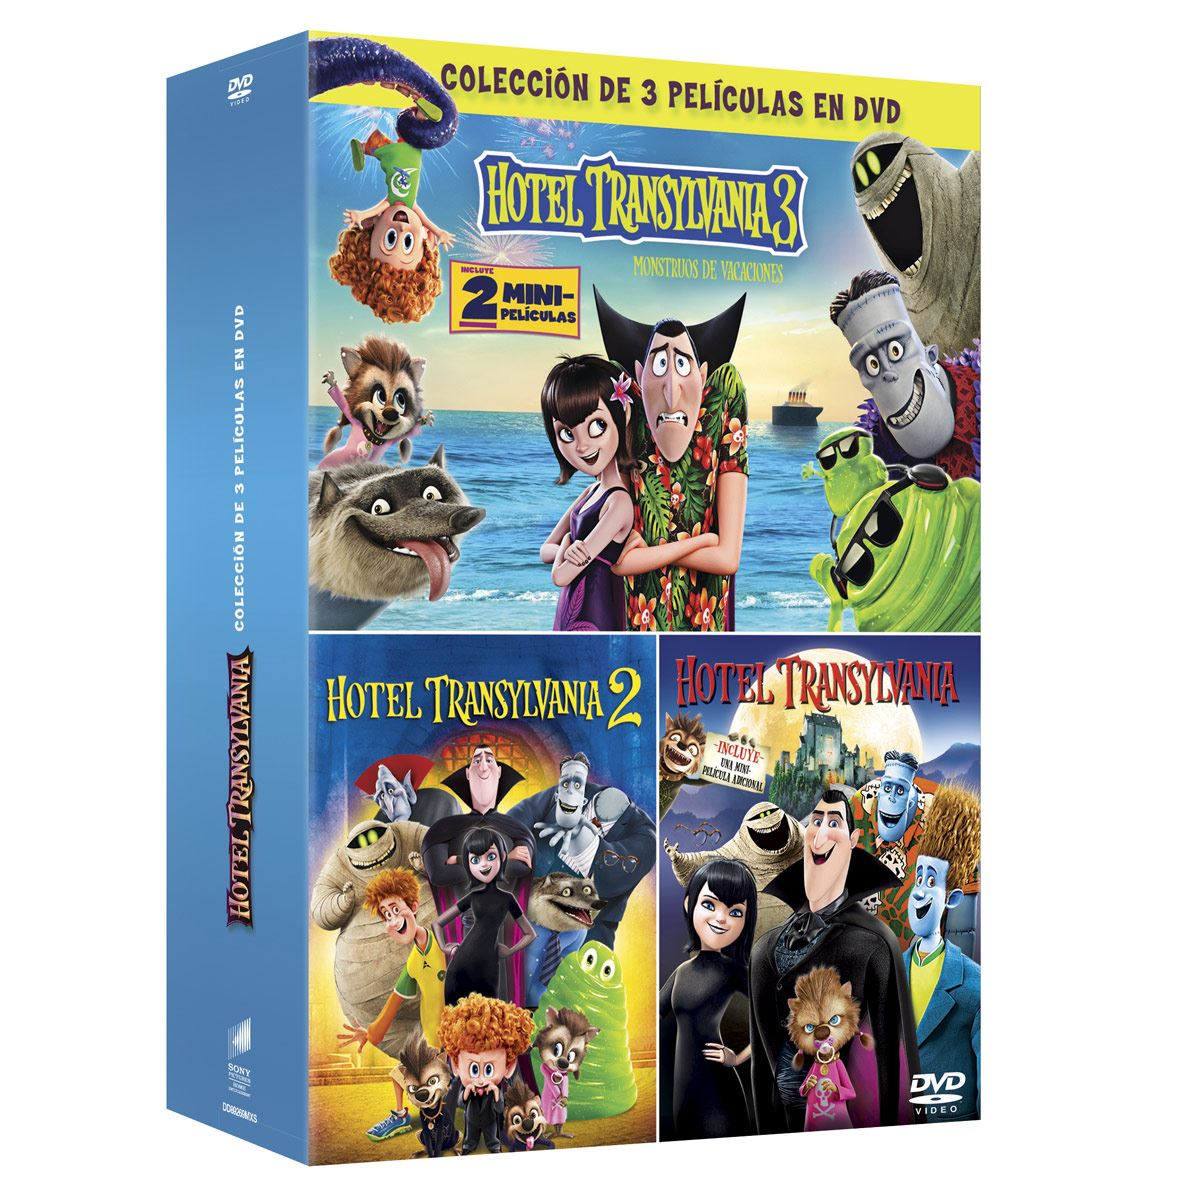 DVD Boxset Hotel Transylvania